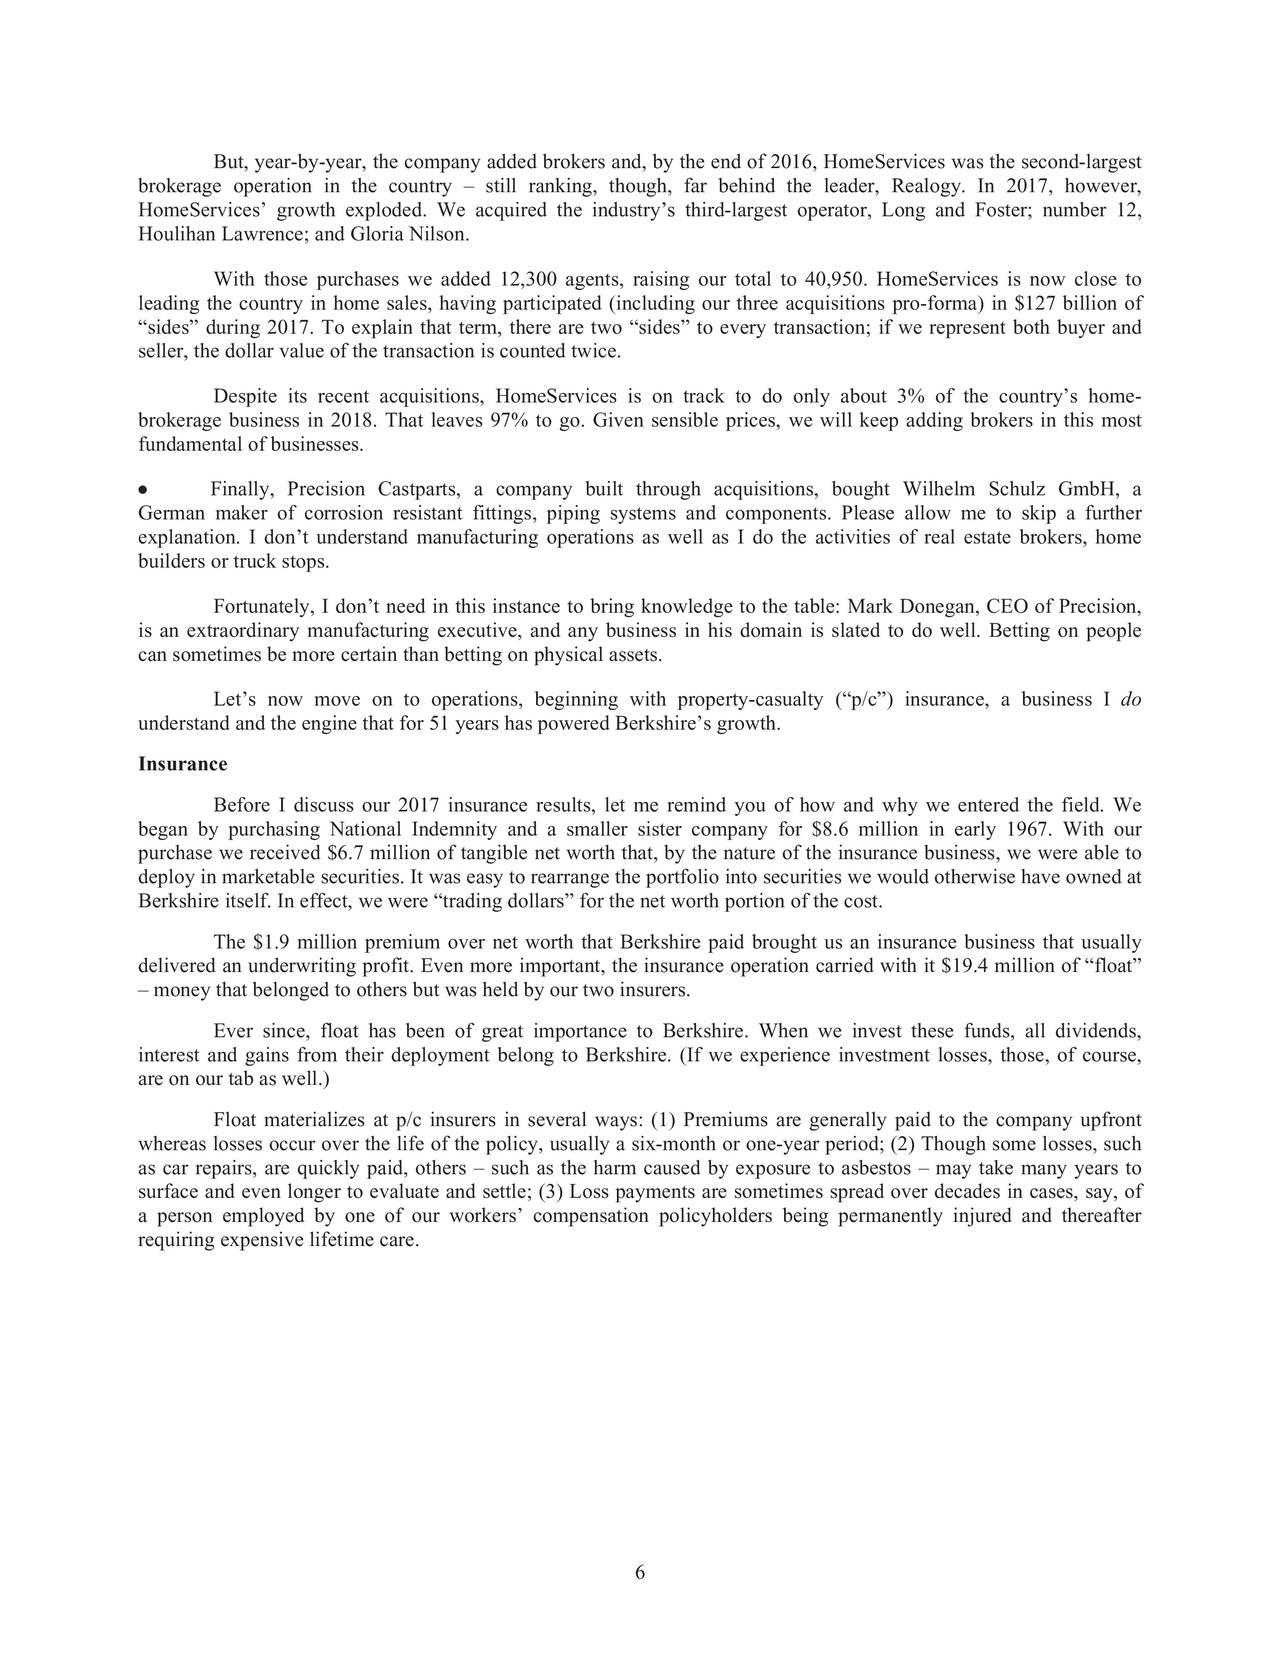 Berkshire Hathaway 2017 Annual Letter - Berkshire Hathaway A (NYSE:BRK.A) | Seeking Alpha